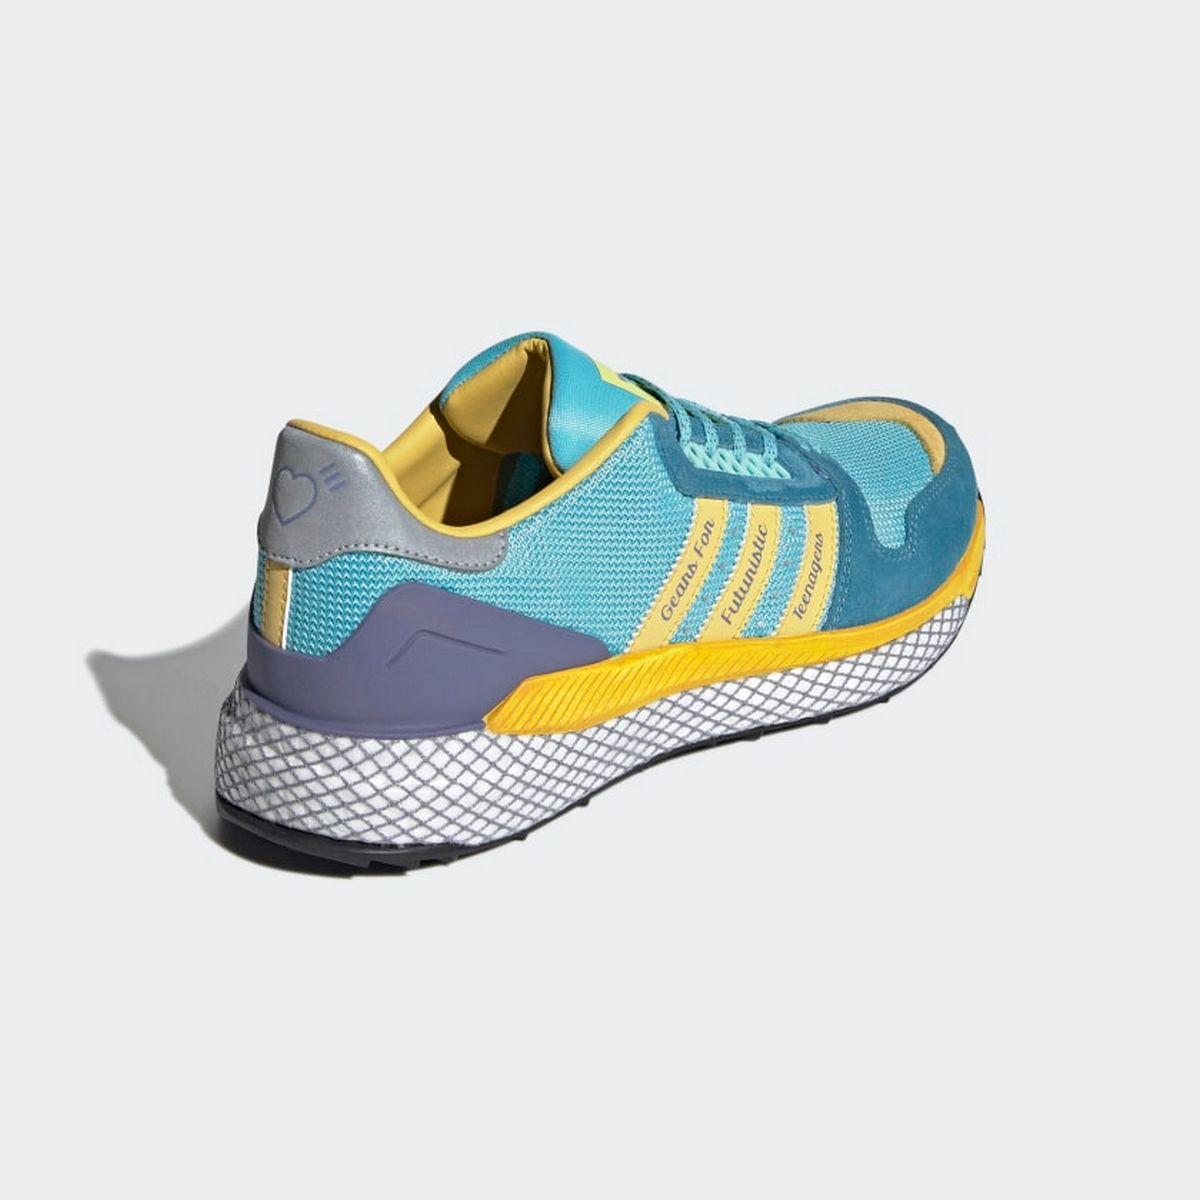 adidas x Human Made - Questar - light aqua/st fade ocean/core black - GY3018